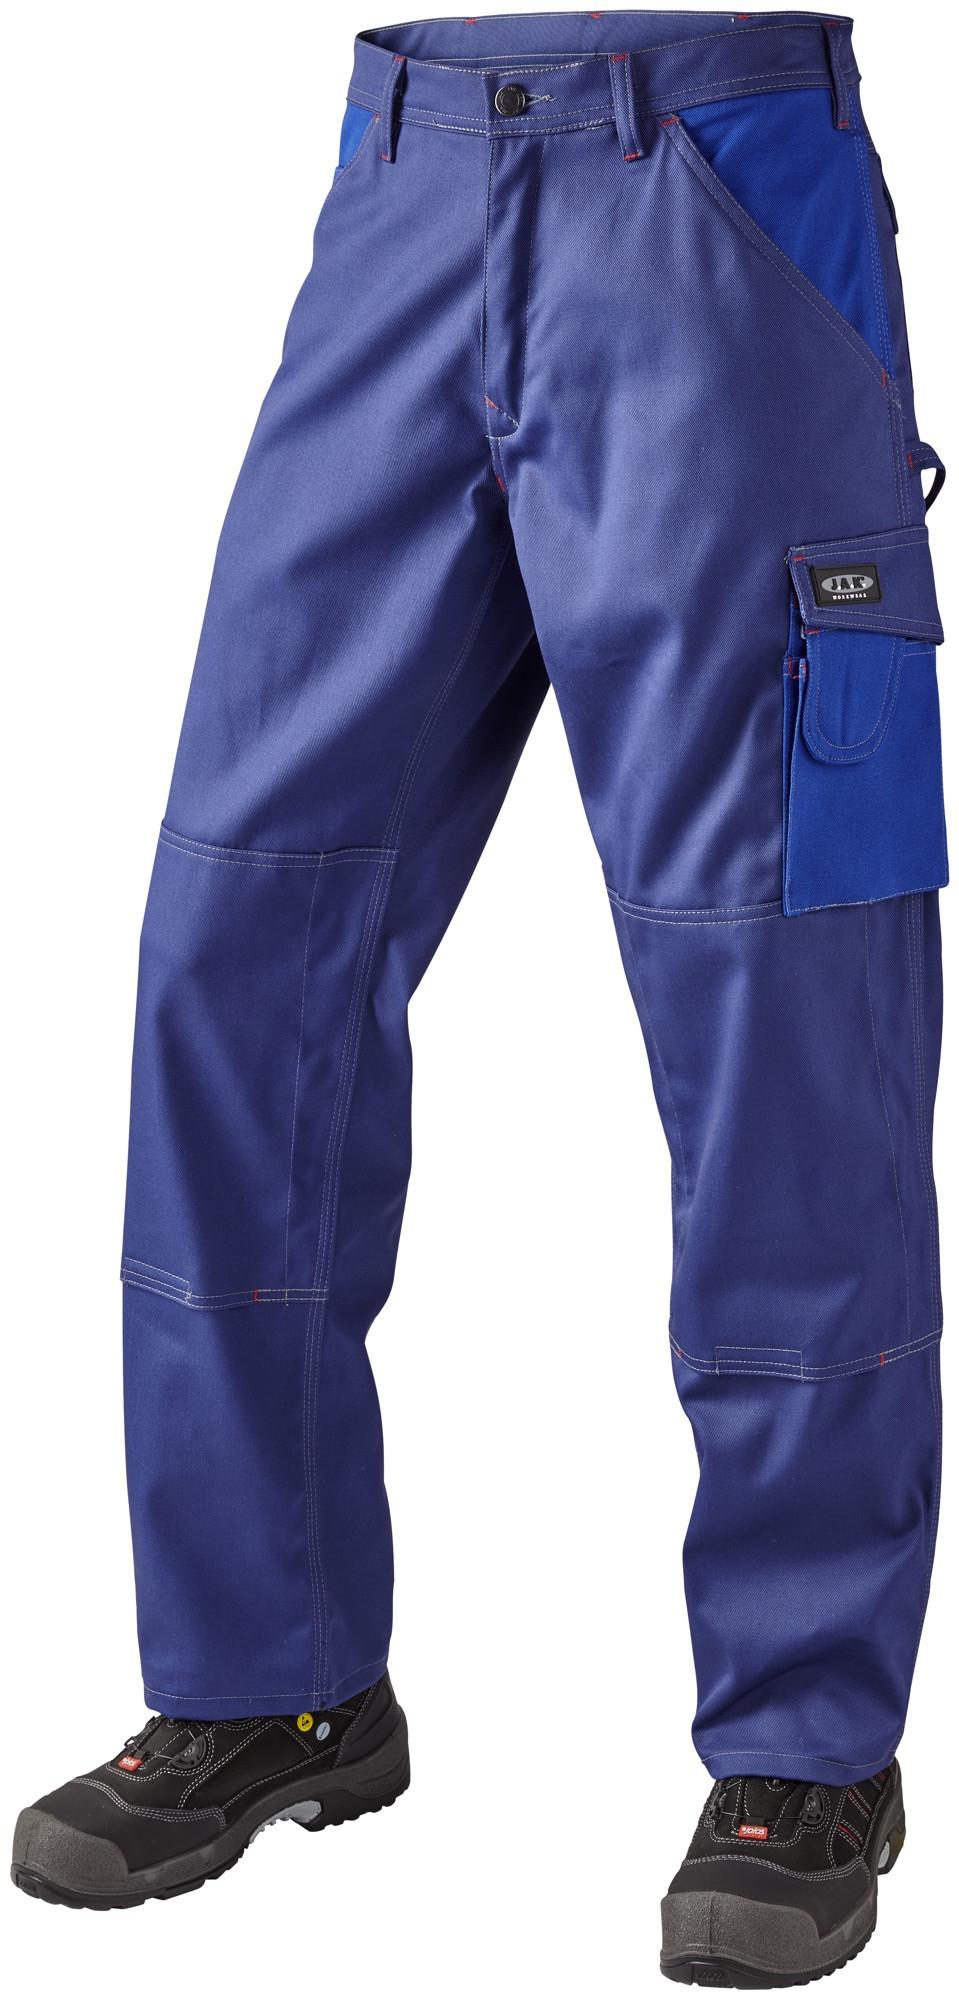 Arbejdsbukser, 100% bomuld, 10206 - Marine/Kongeblå